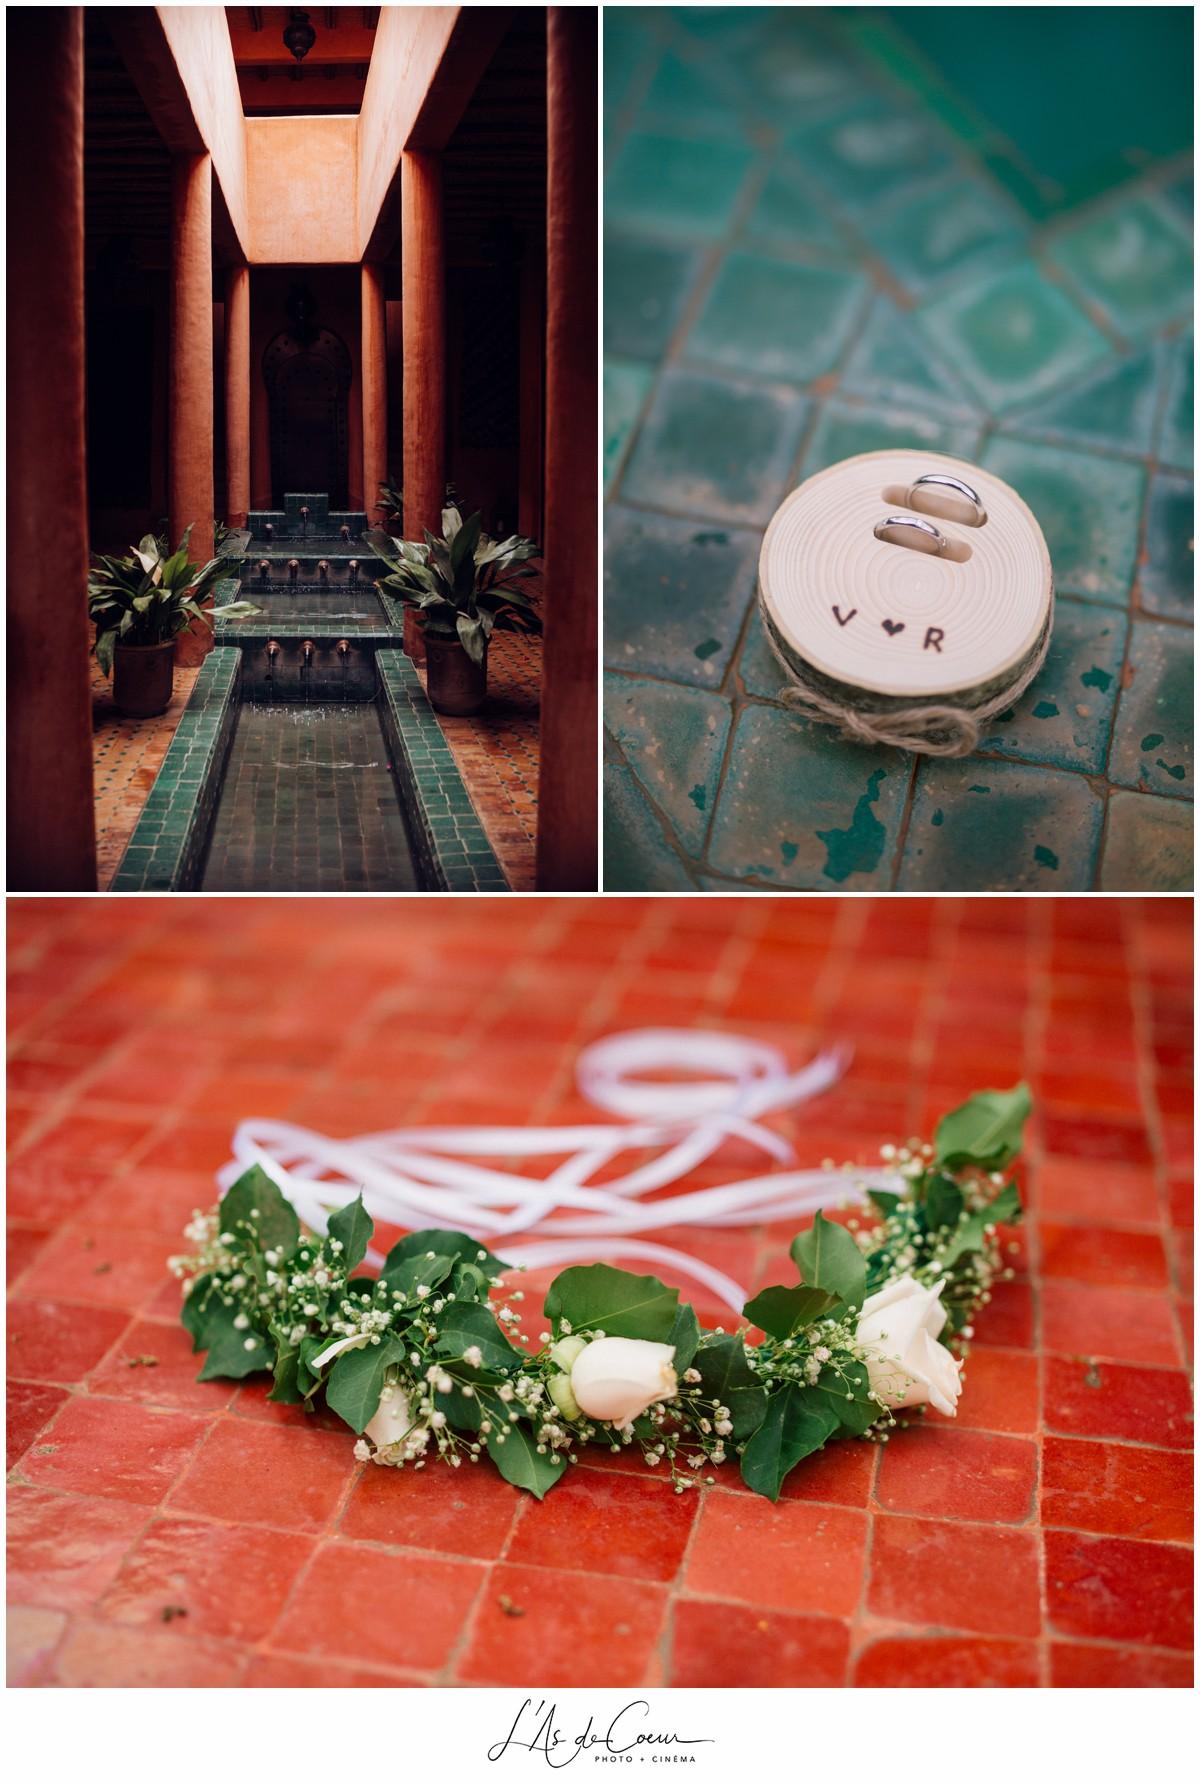 Details Photographe Mariage Essaouira le Jardin des Douars Maroc ©lasdecoeurphoto